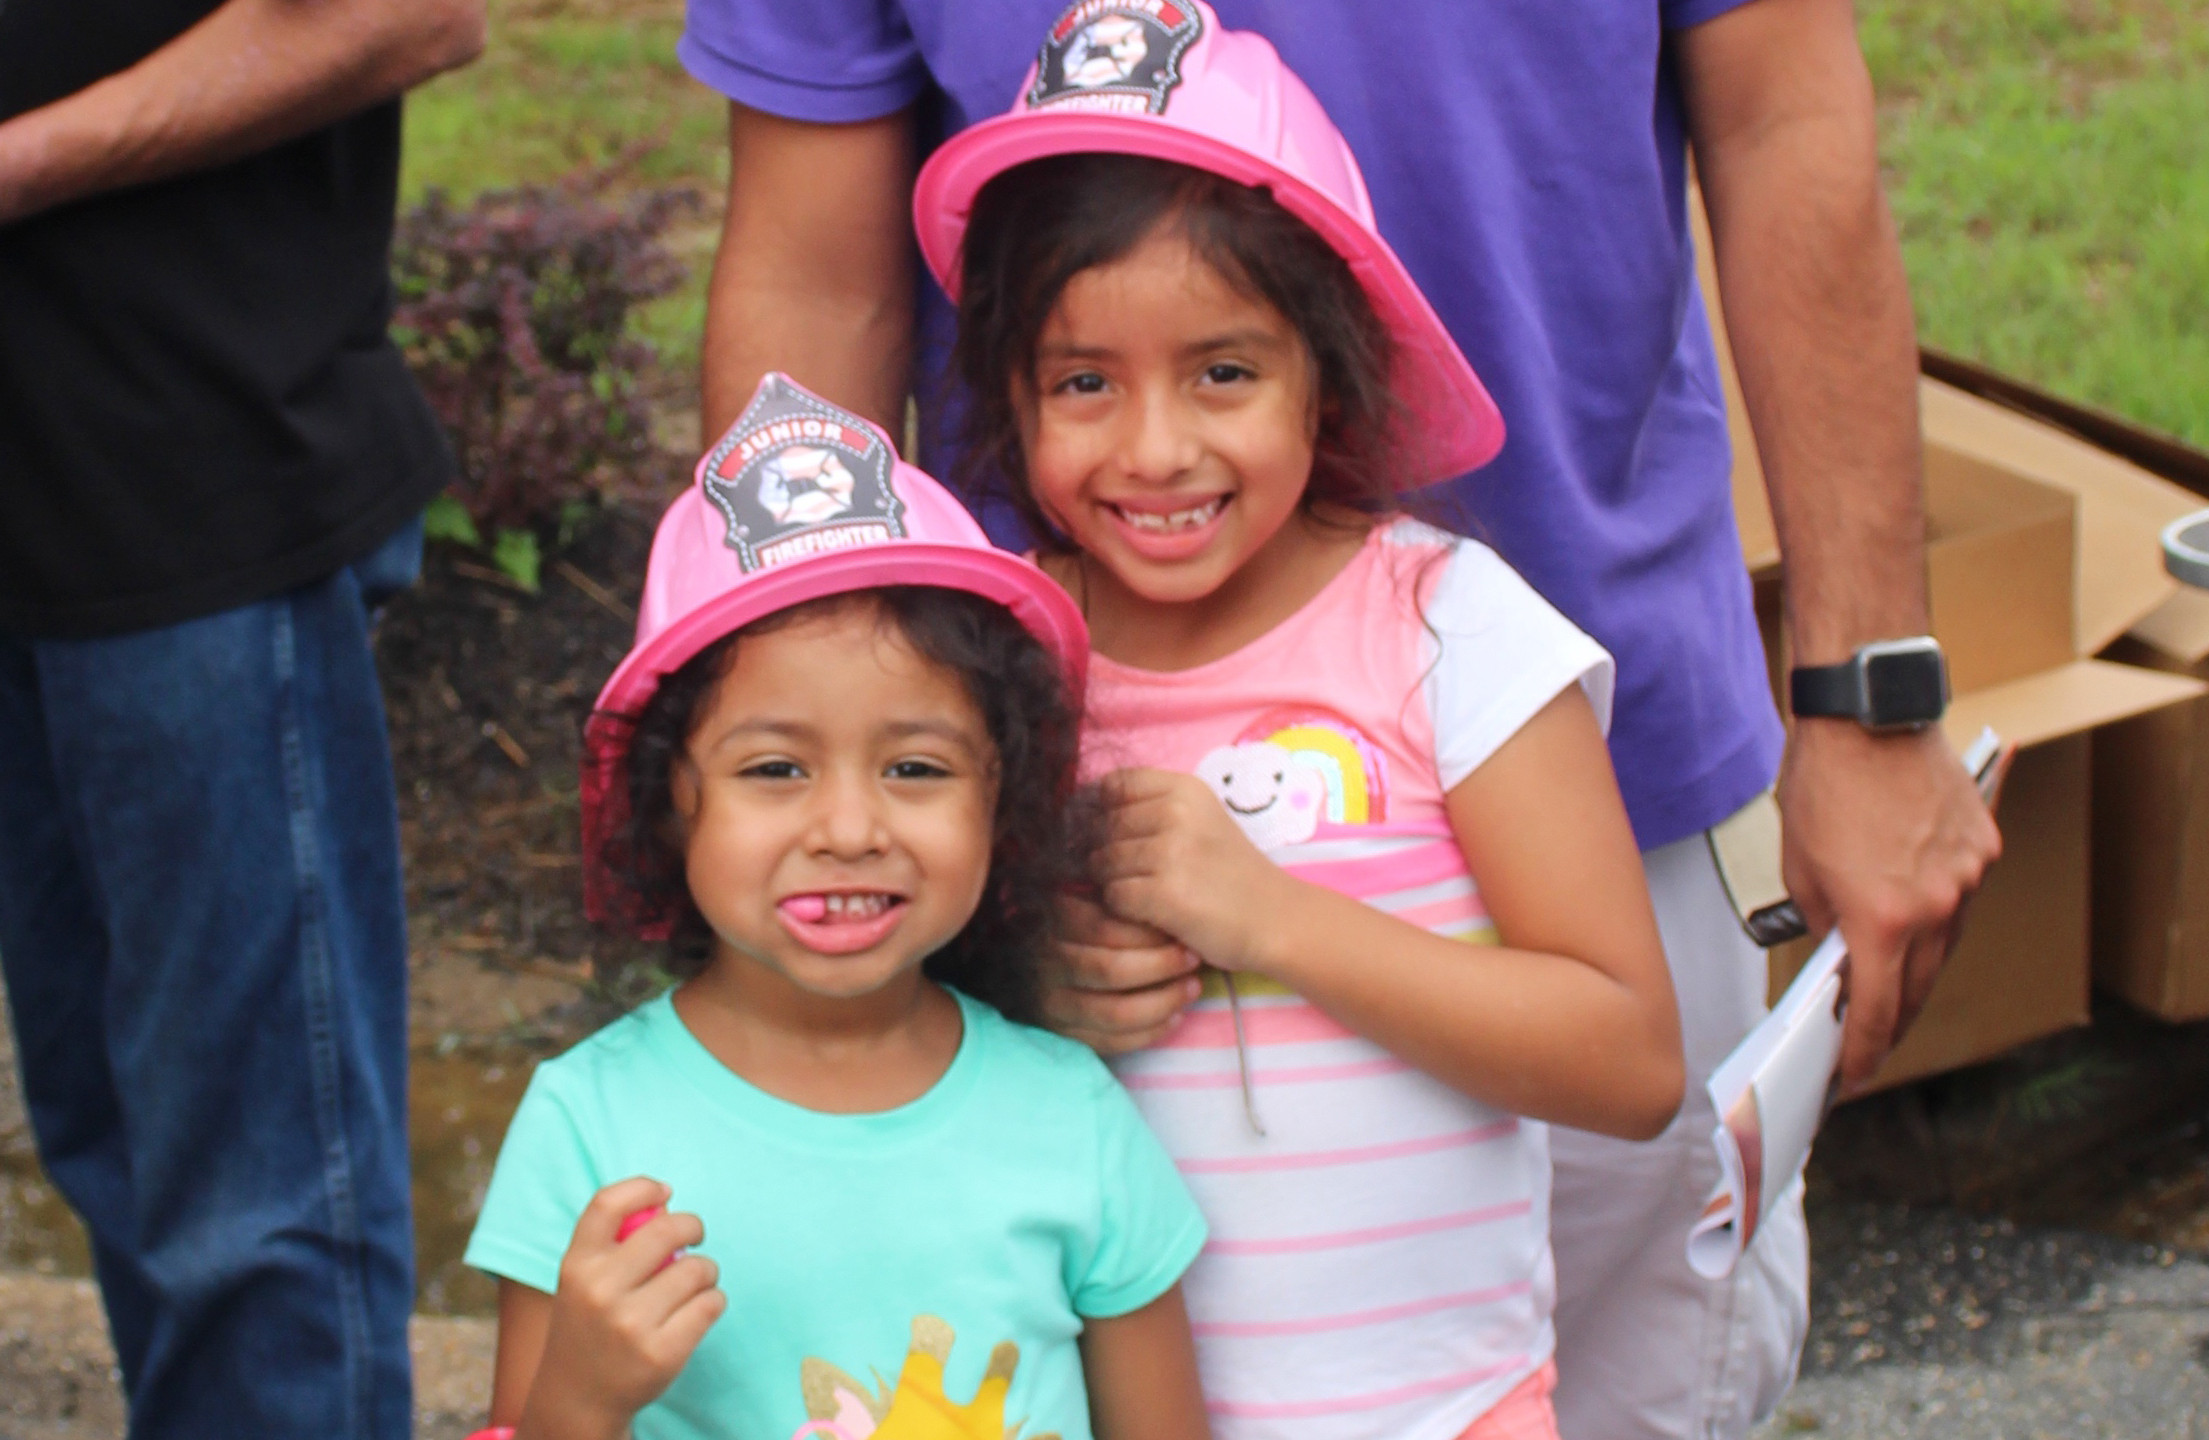 Girls in pink Fire hats